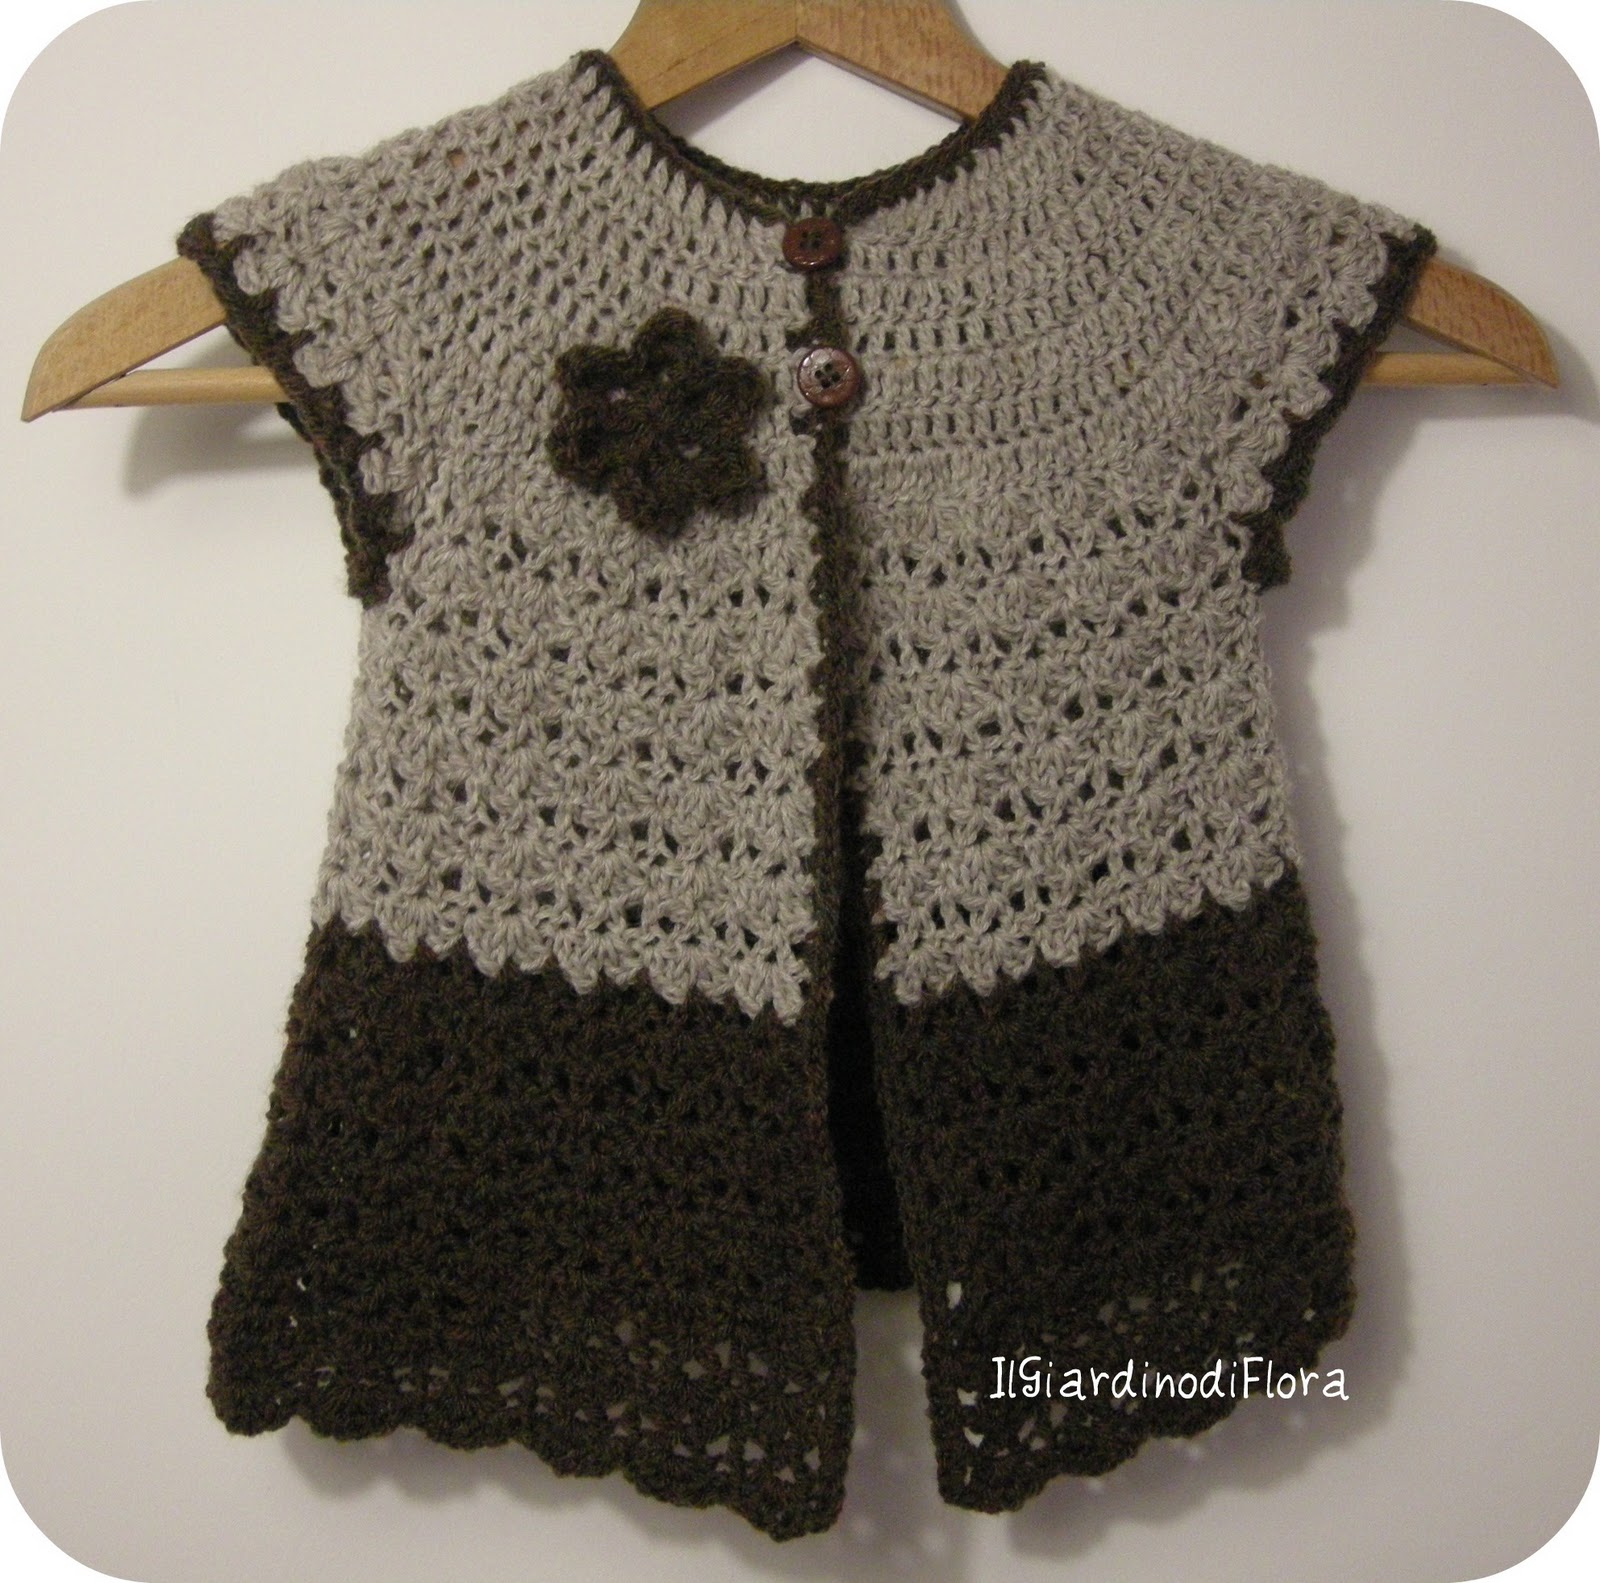 Gilet di lana all'uncinetto per bambina